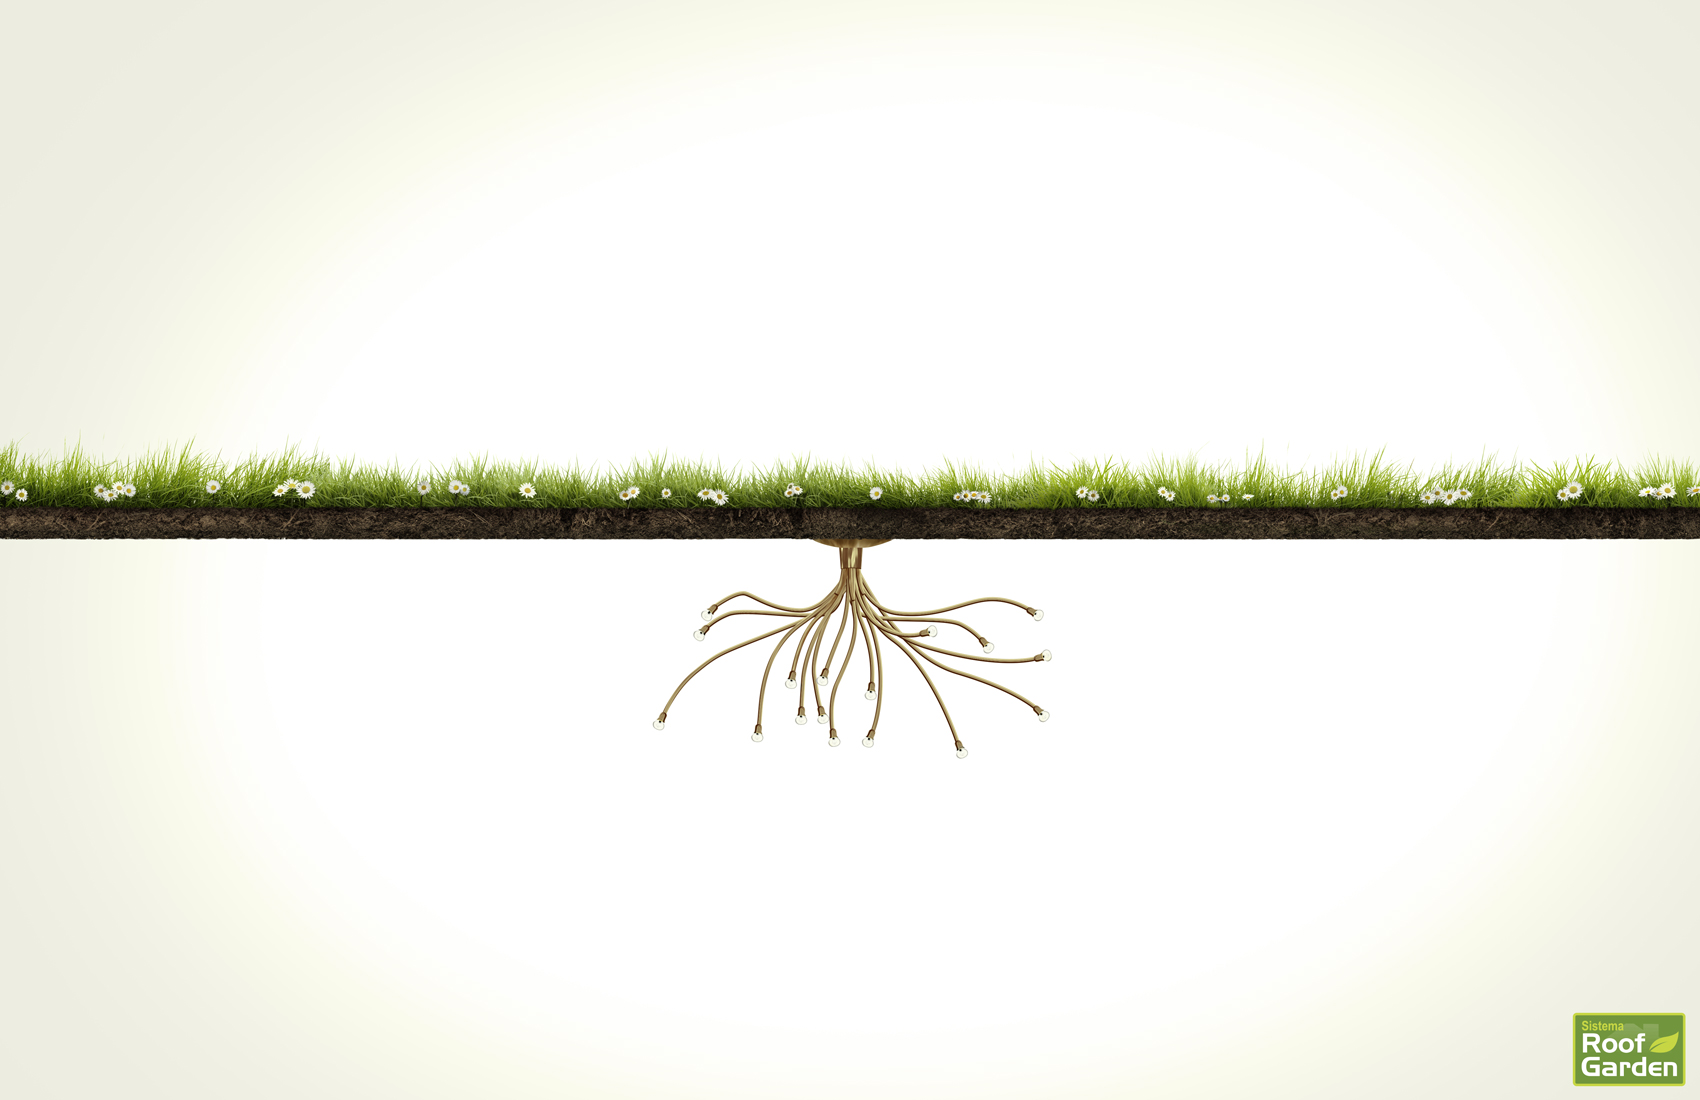 Attirant Roof Garden Print Ad   Grass, 2